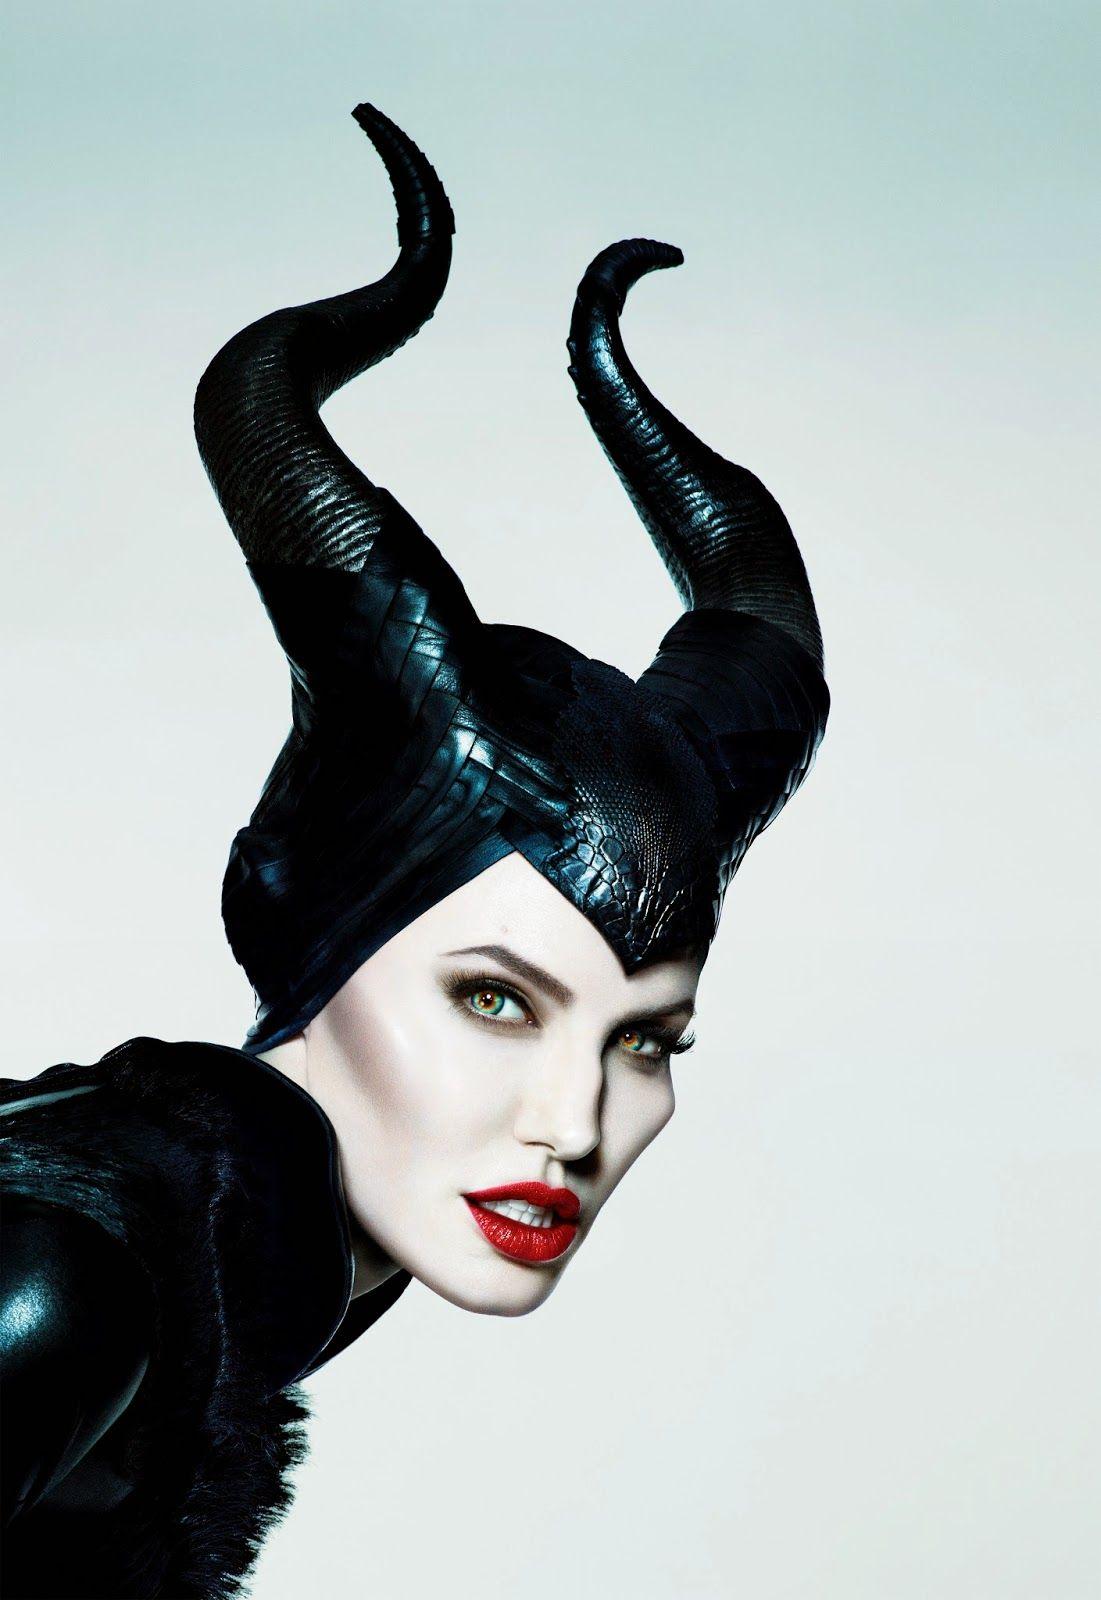 Maleficent Face Angelina Jolie Peliculas Fantasia